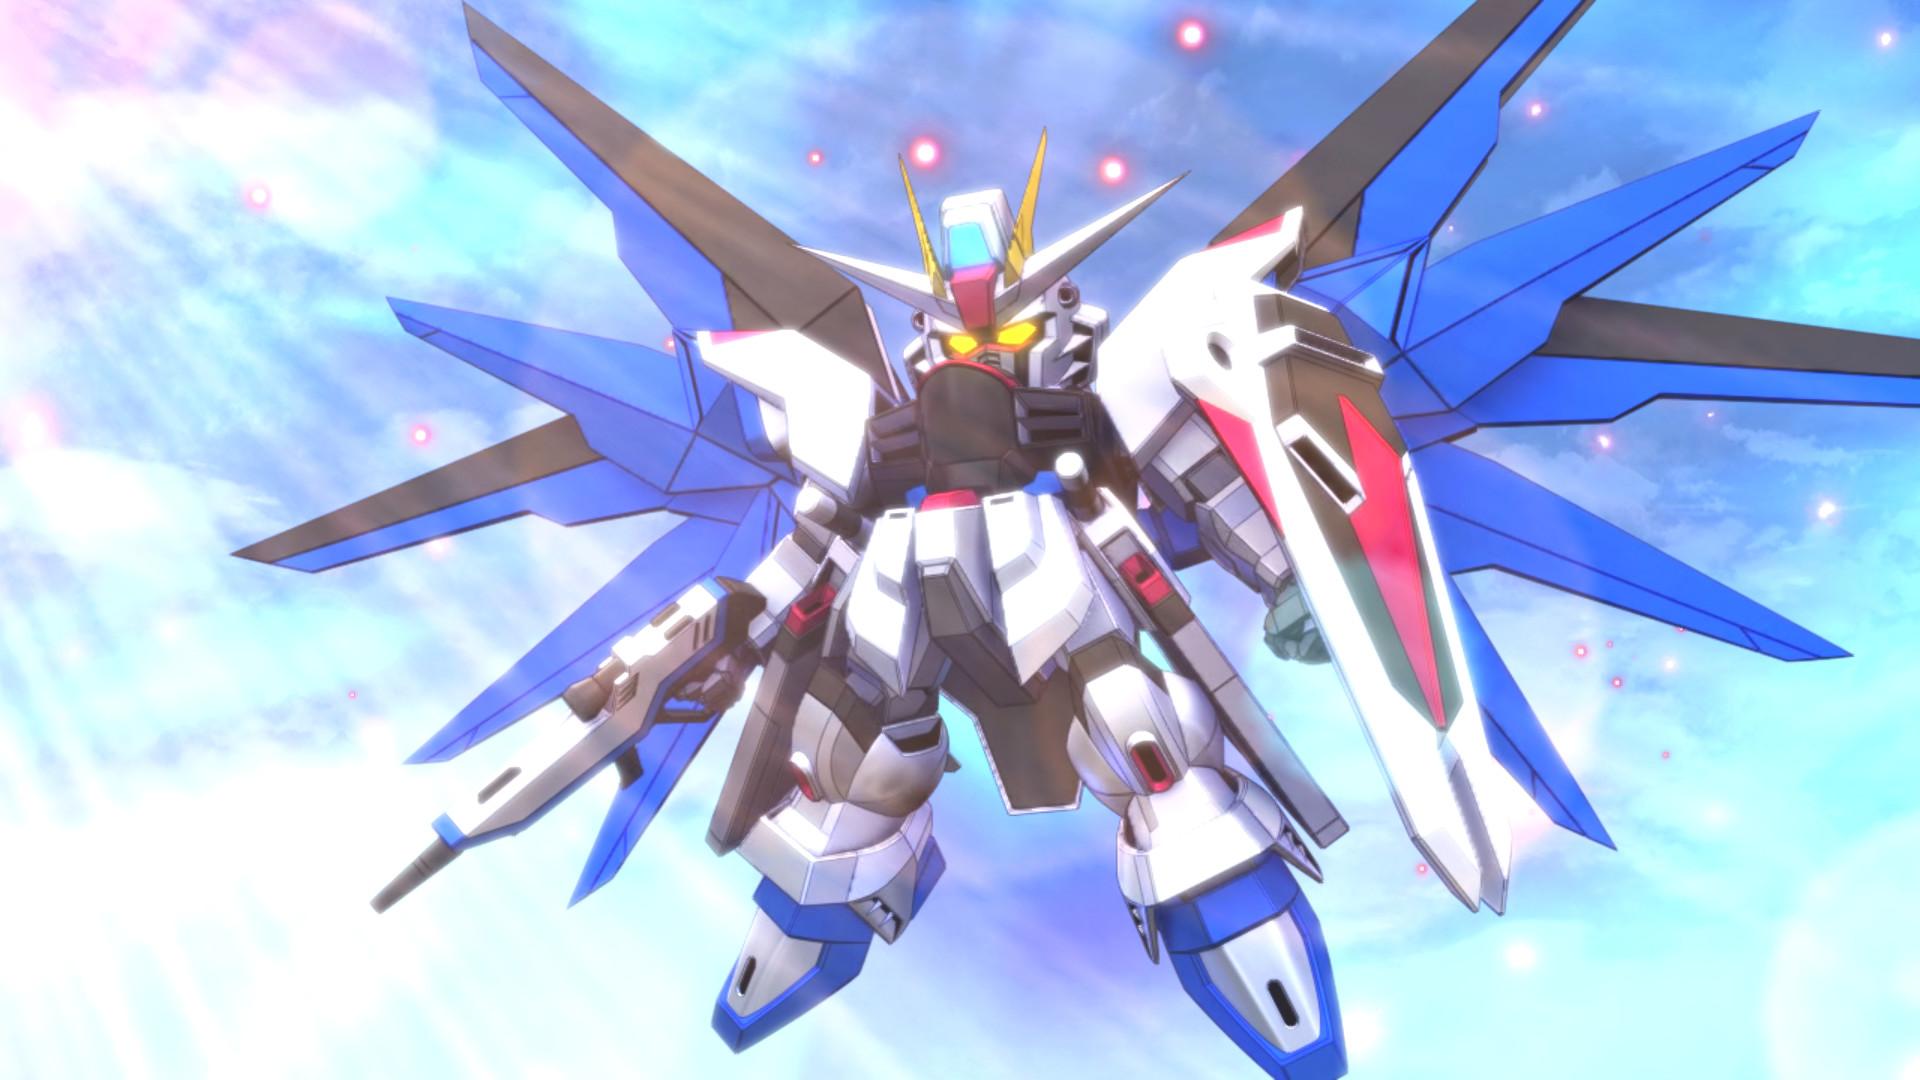 《SD高达G世纪:火线纵横》DLC宣传片 多款机体将参战